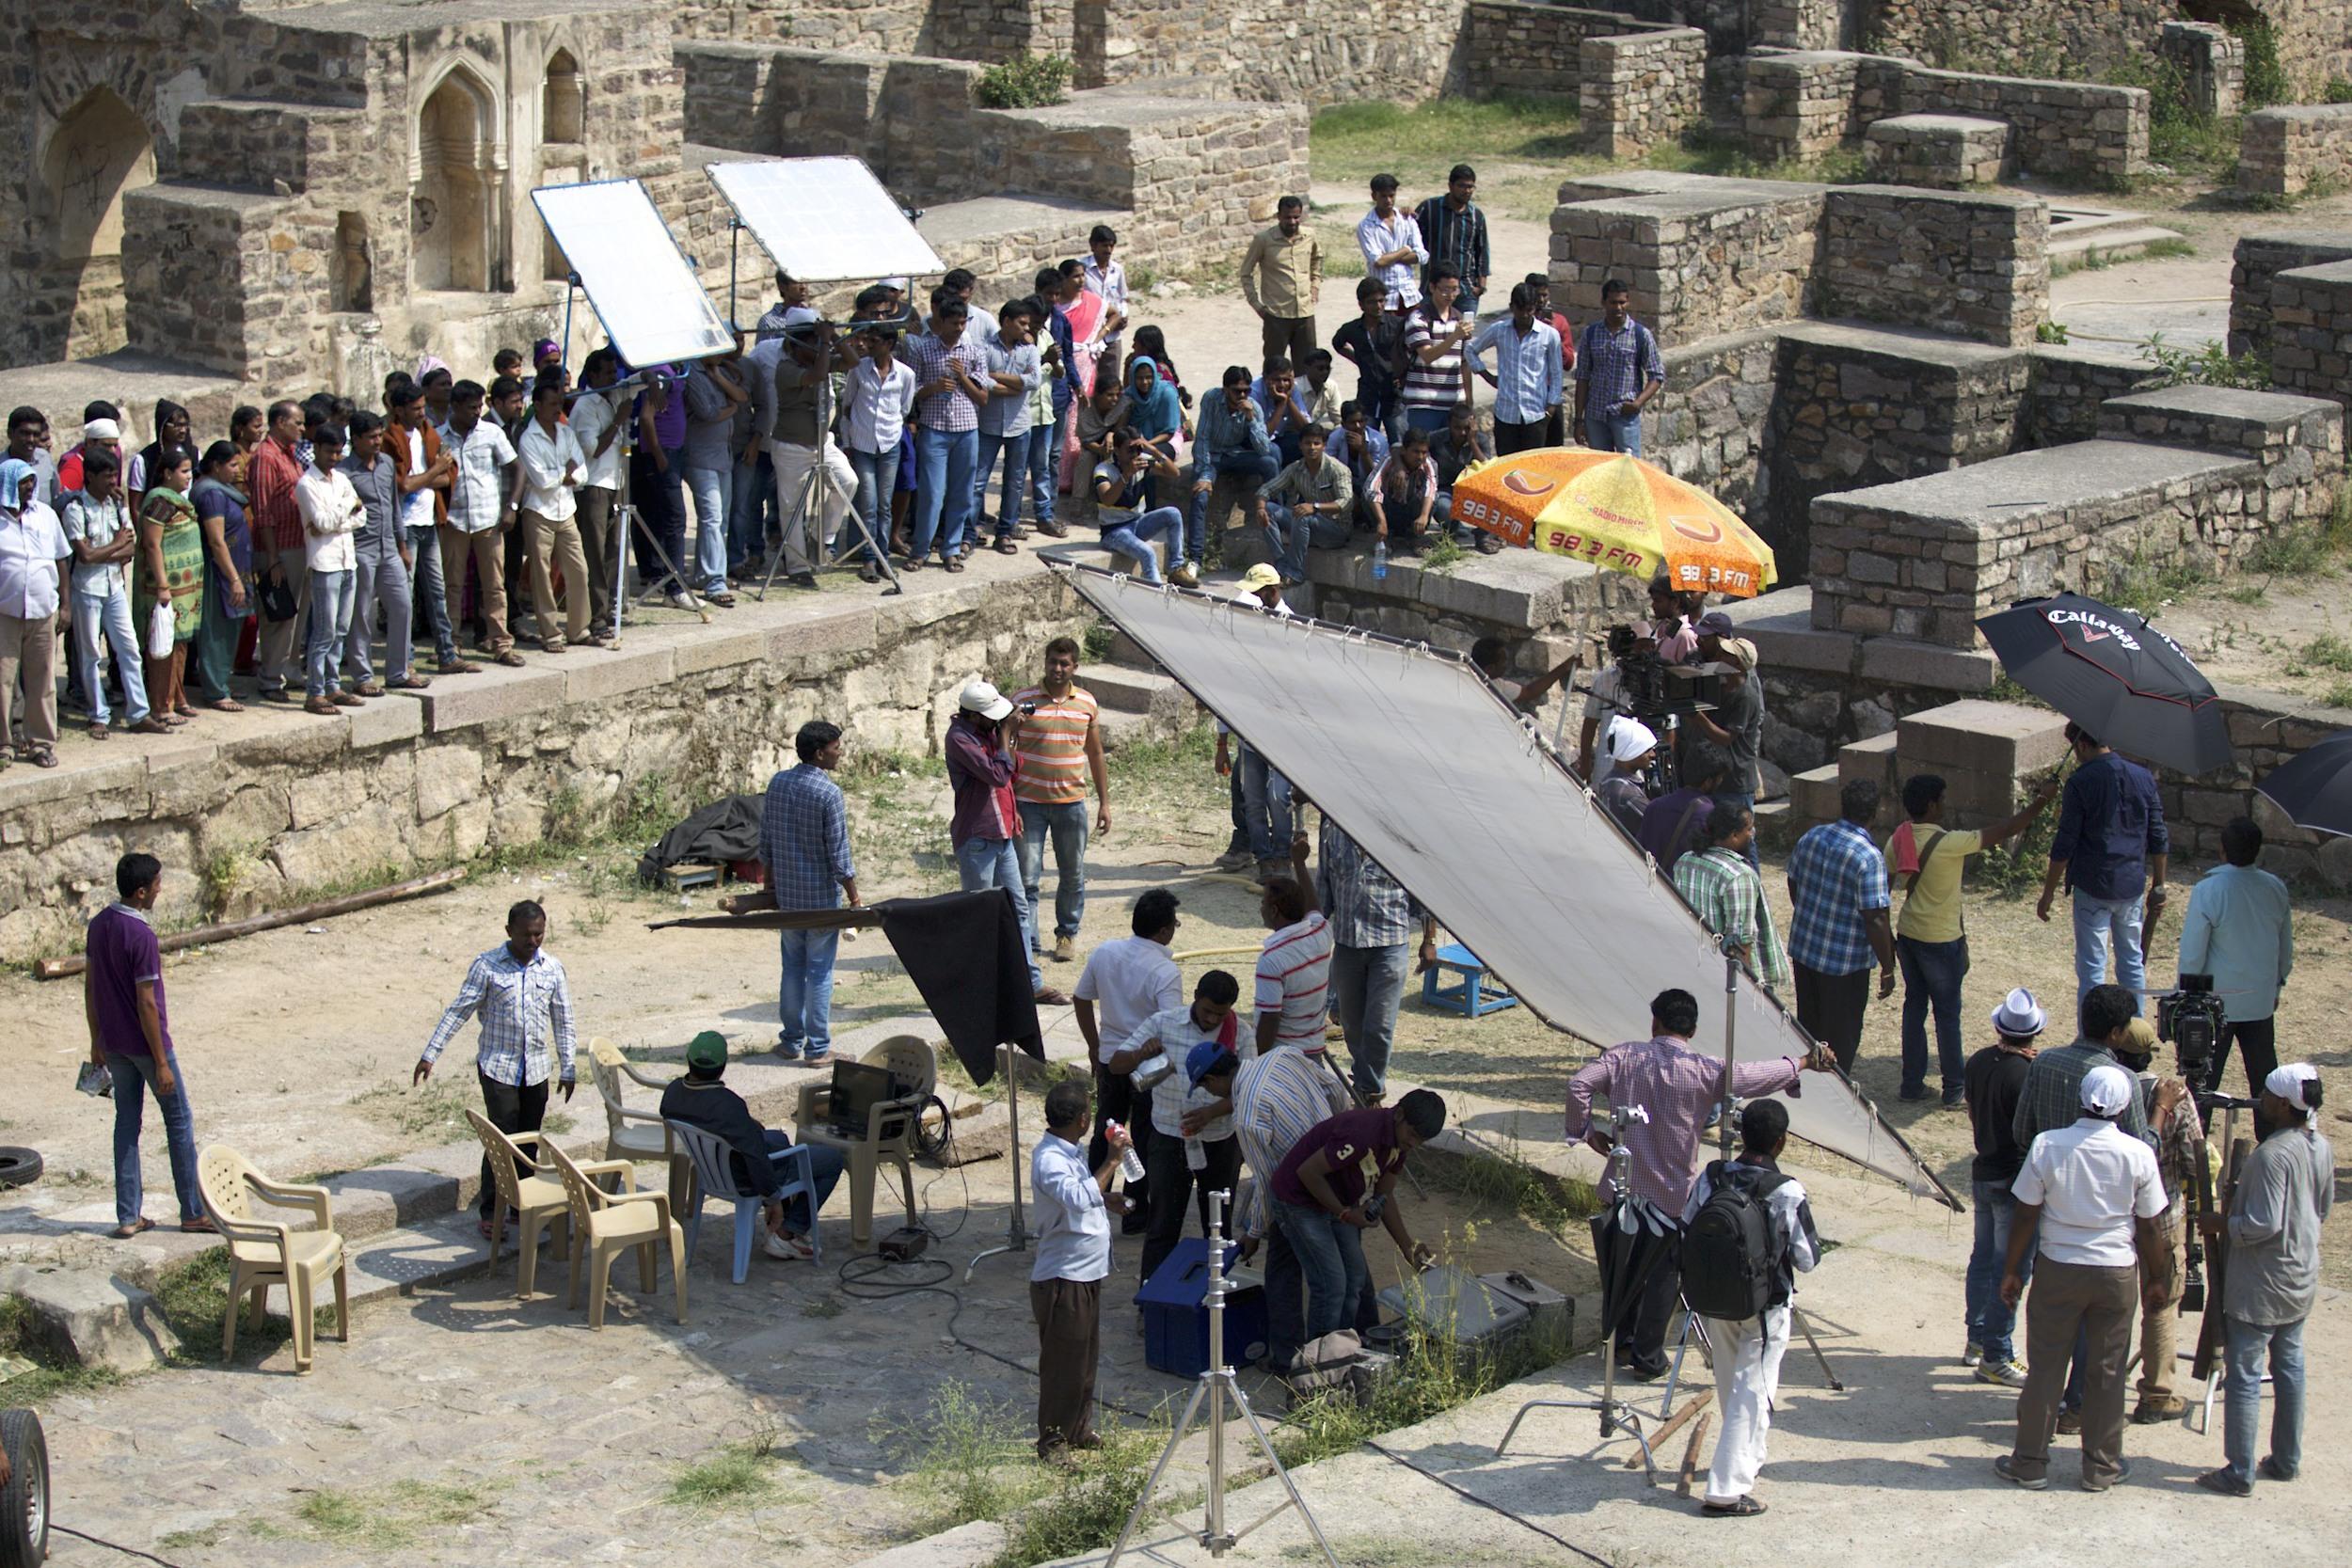 Bollywood Movie set